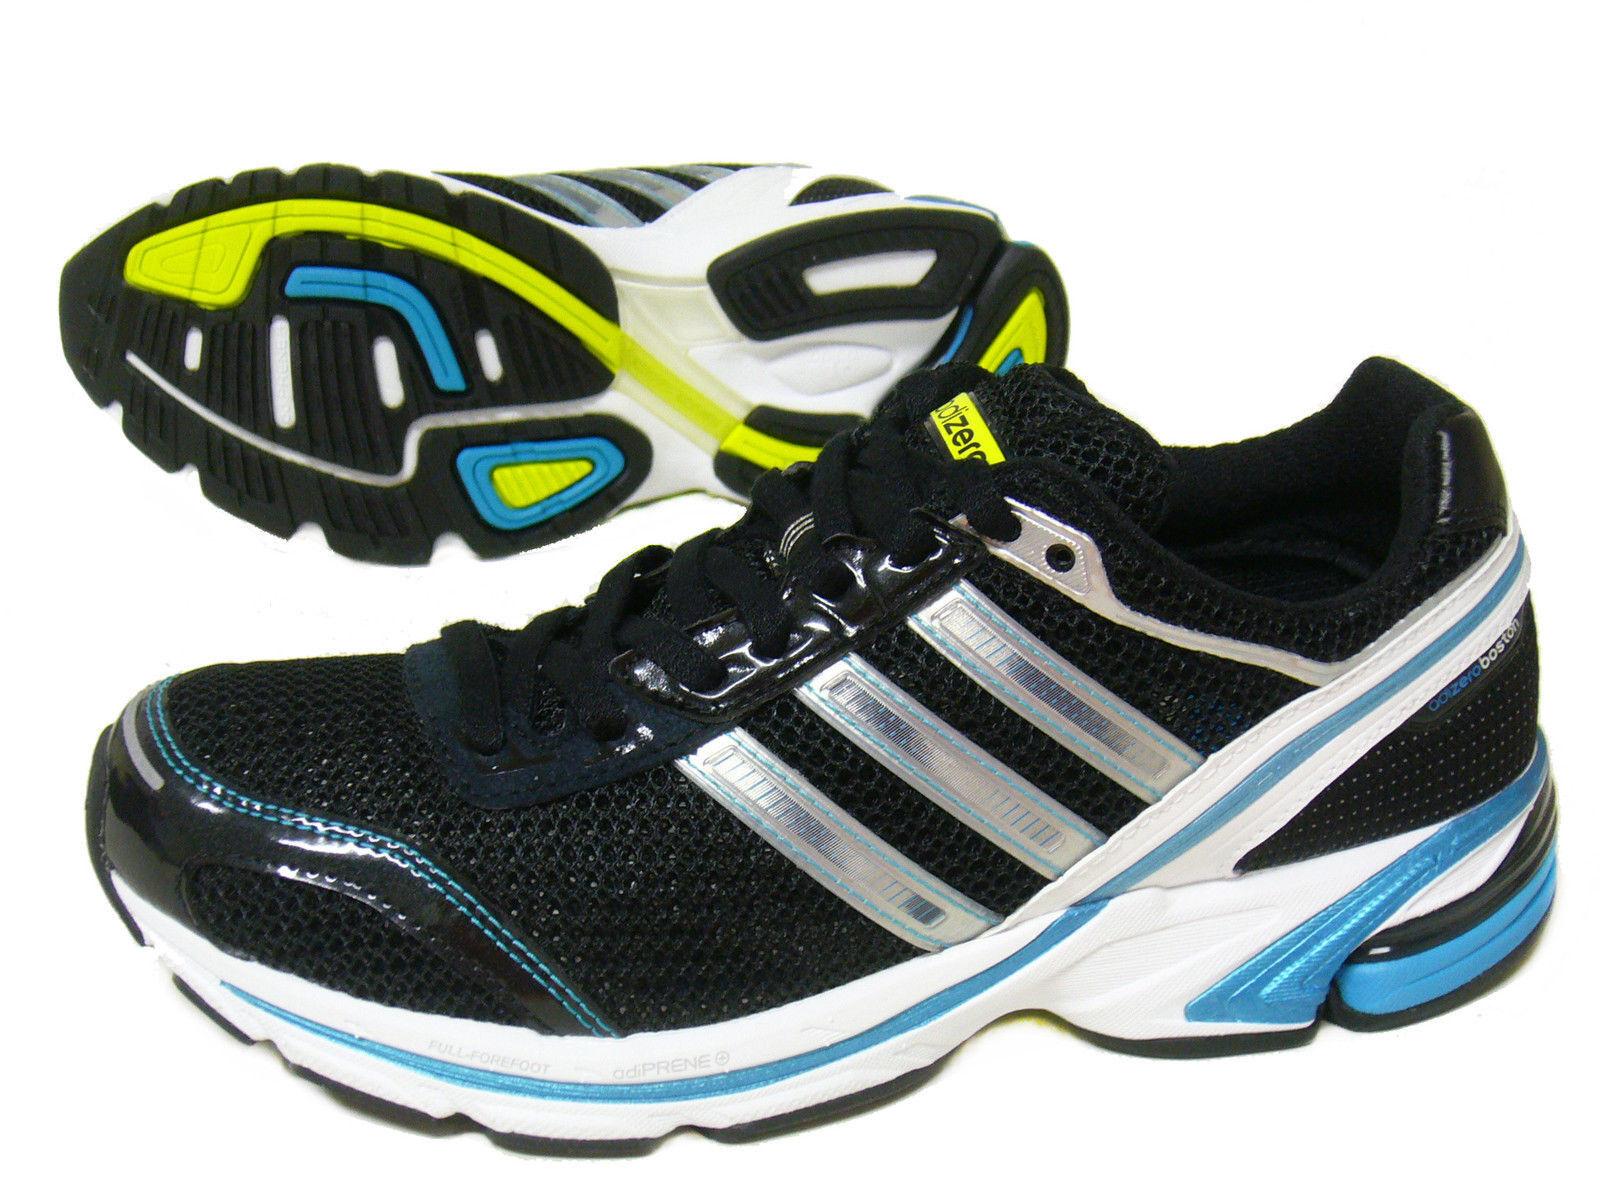 Adidas adizero Boston W Schuhe Laufschuhe Running Damen damen Shohe